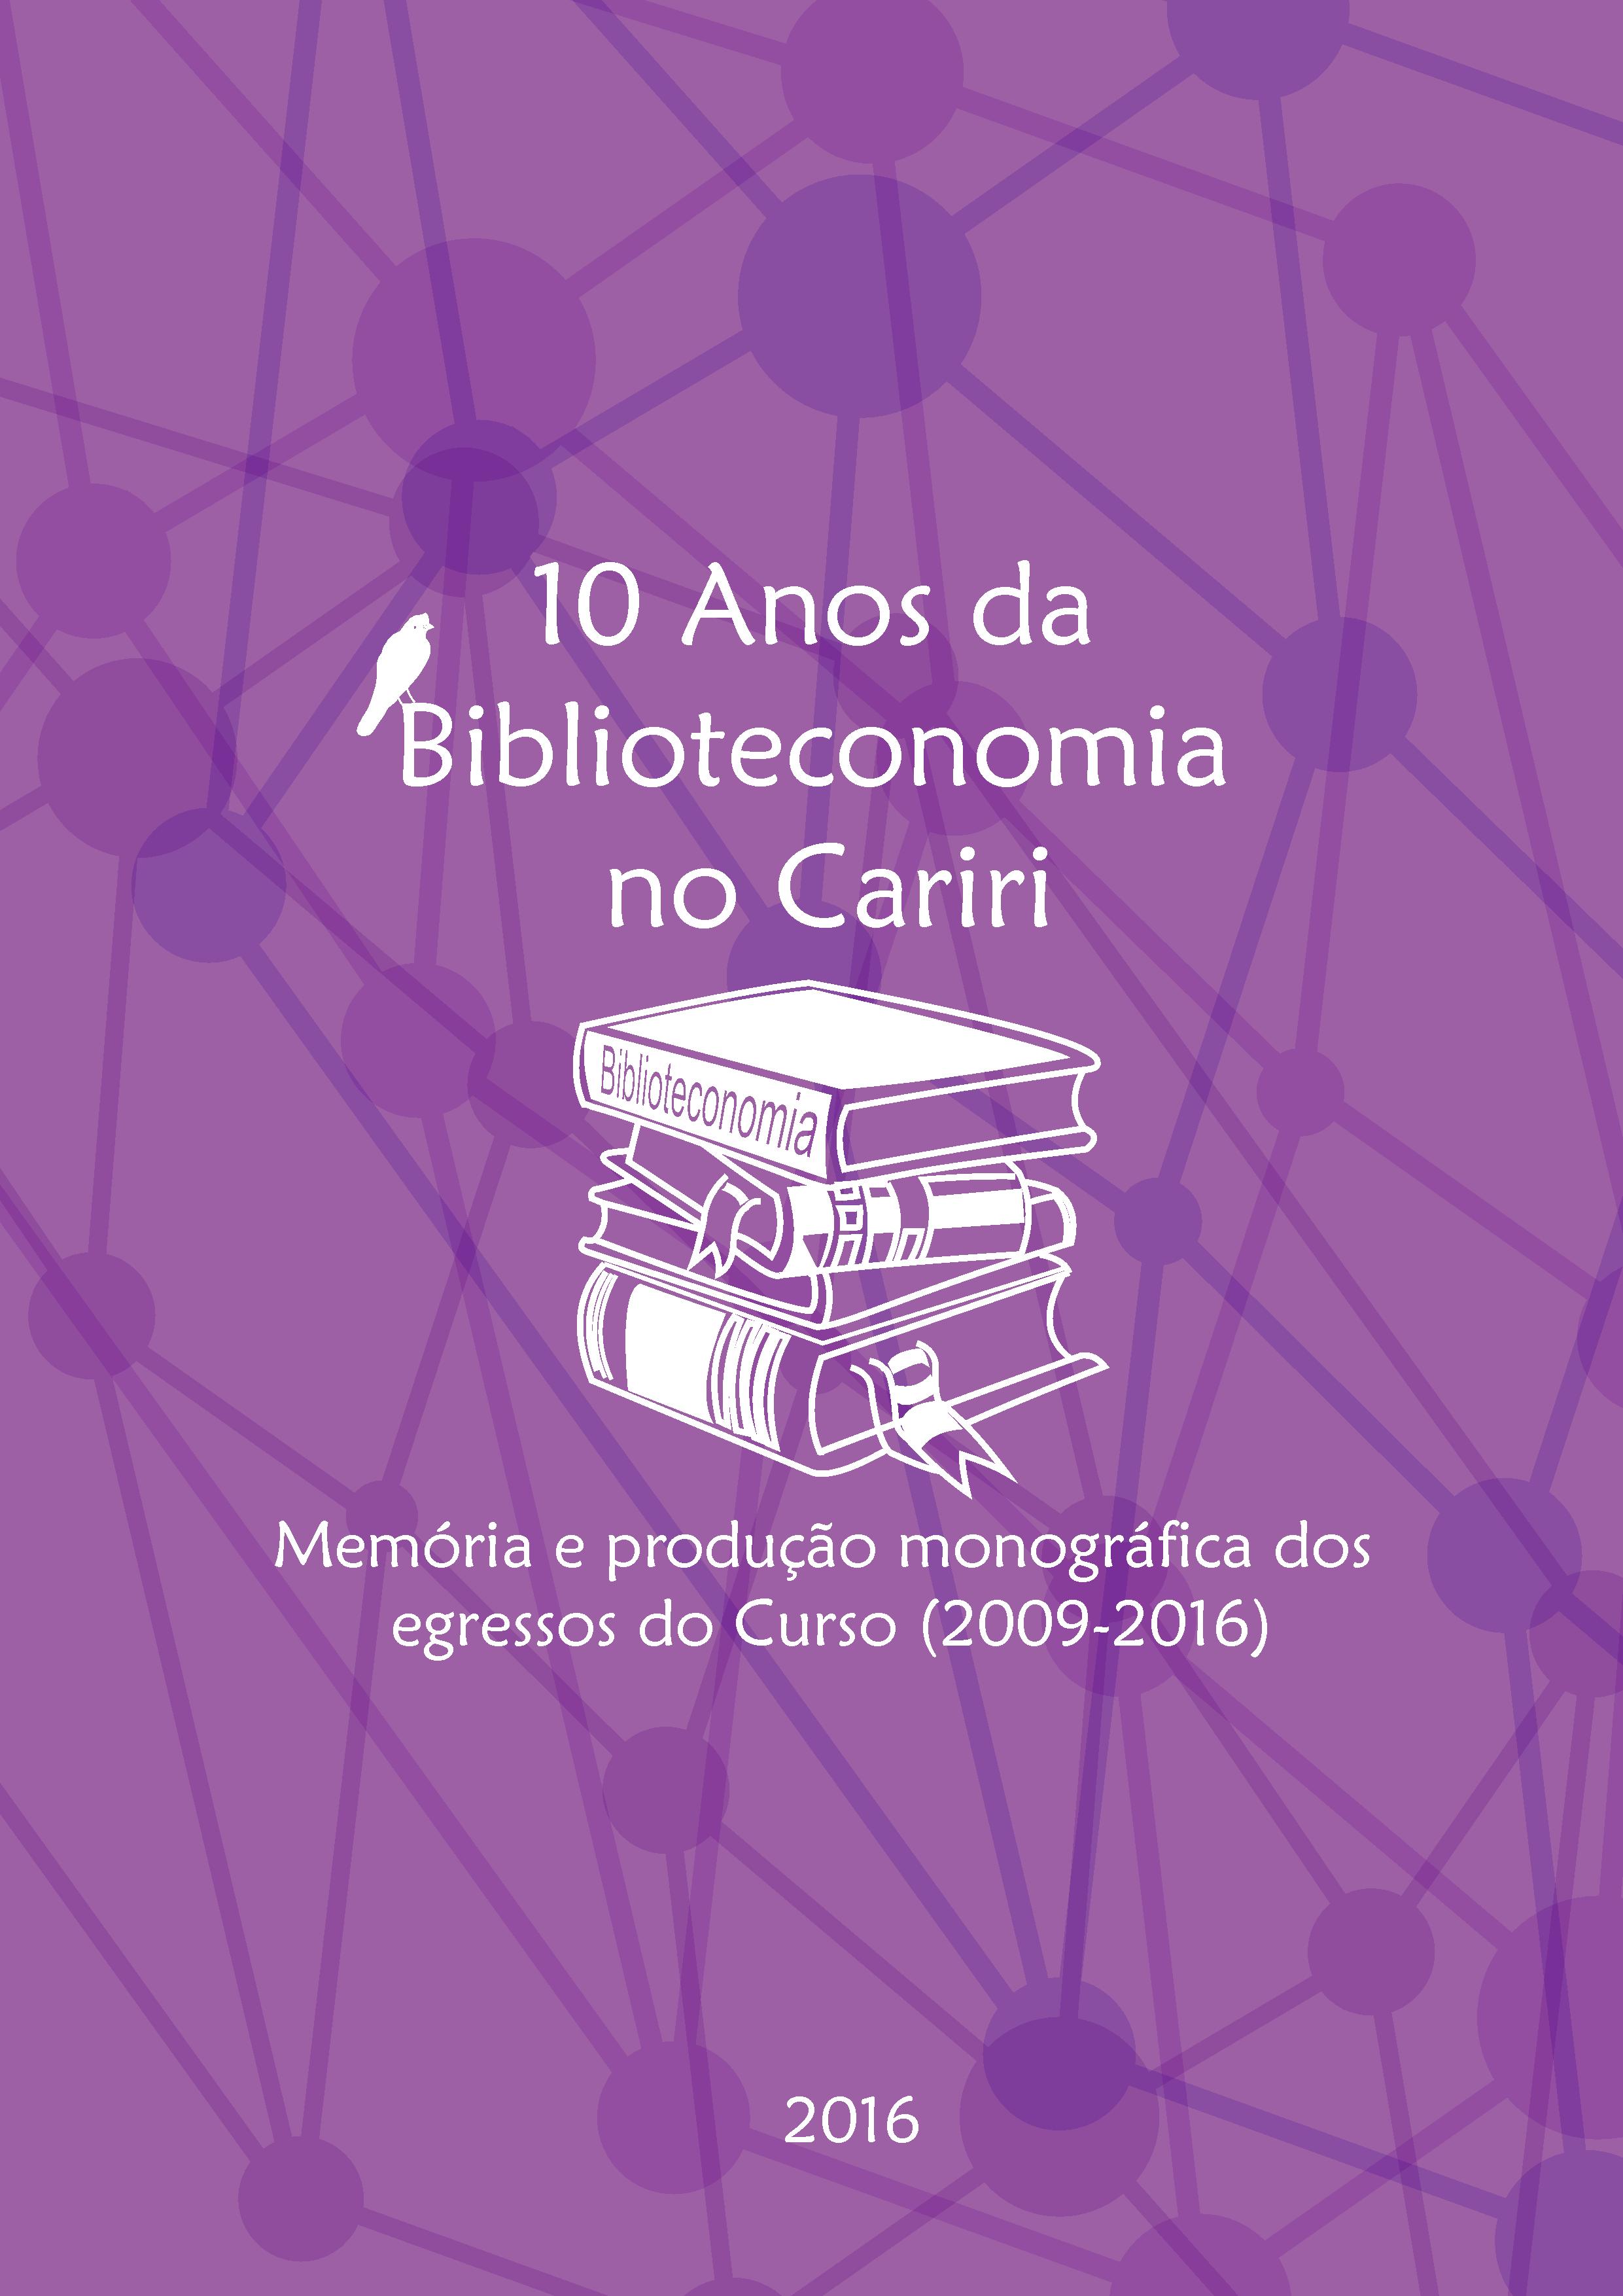 10 ANOS DA BIBLIOTECONOMIA NO CARIRI thumbnail